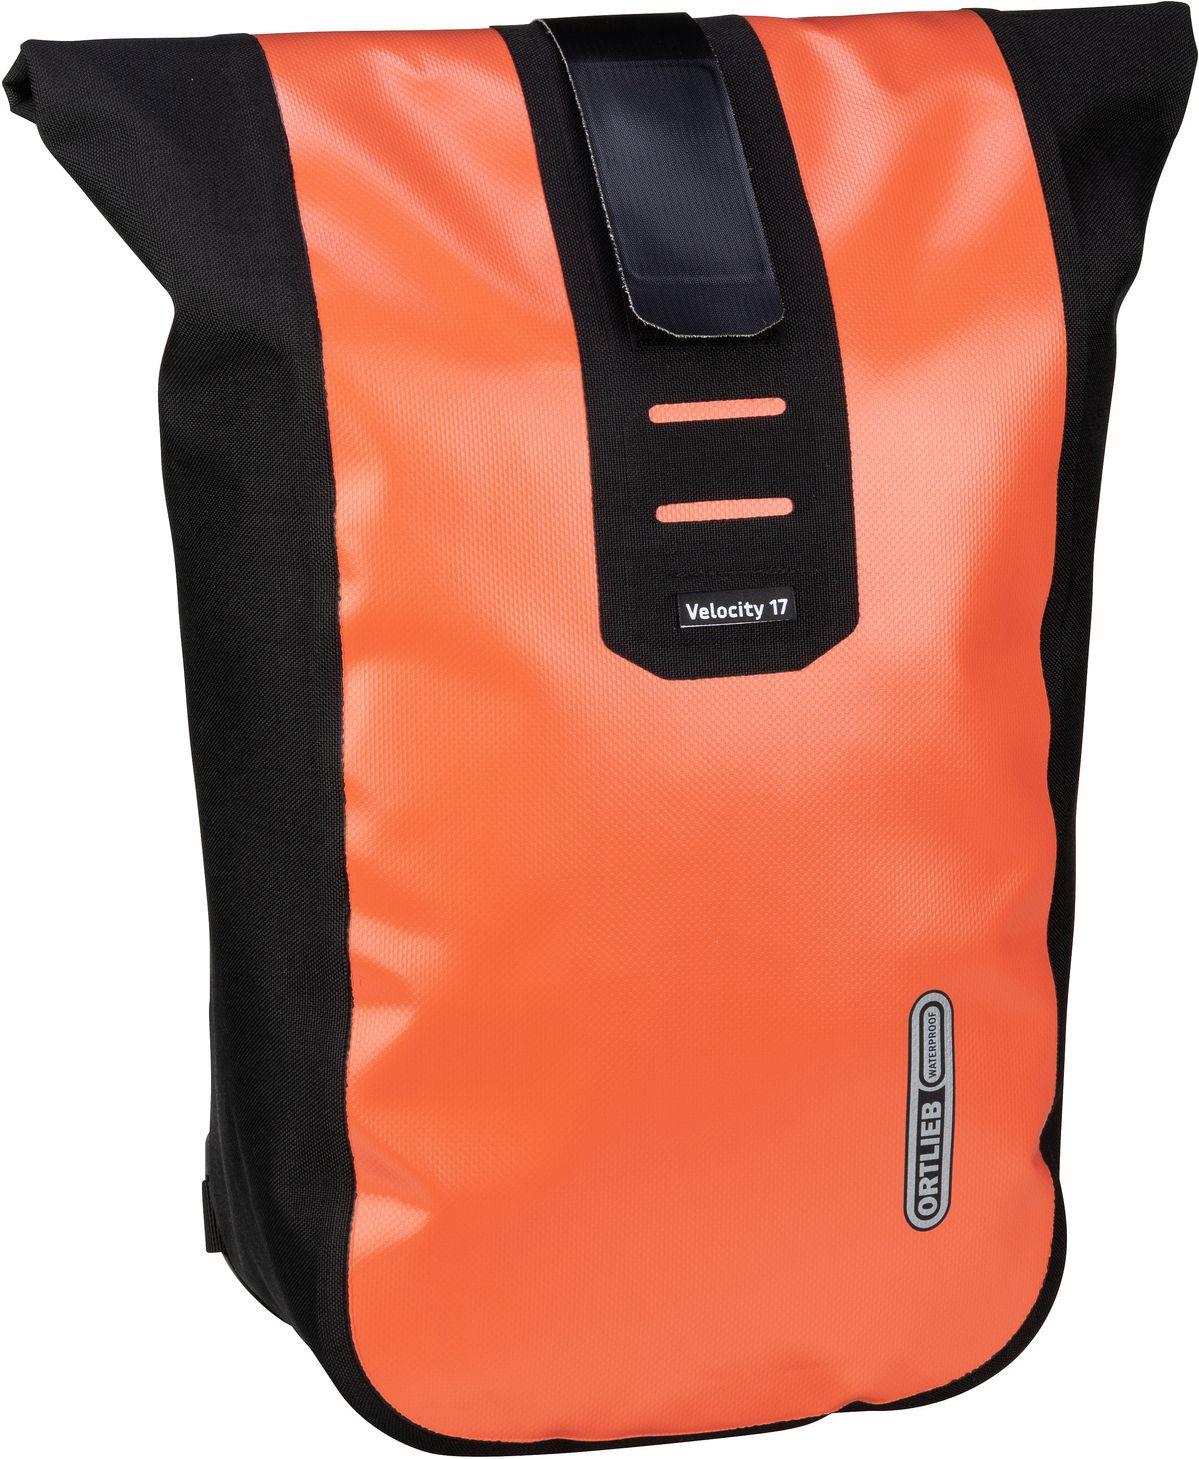 Rucksack / Daypack Velocity 17L Coral-Black (17 Liter)